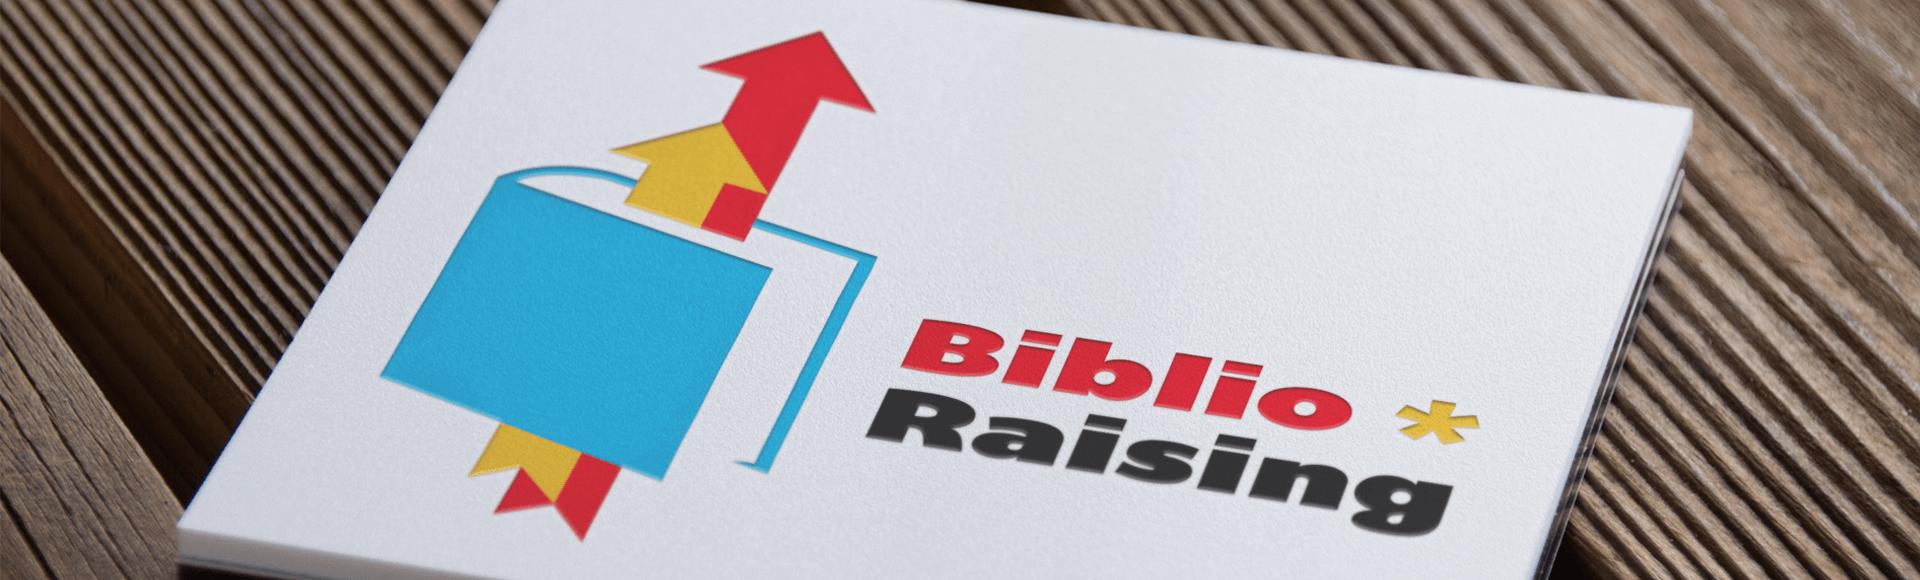 Biblioraising